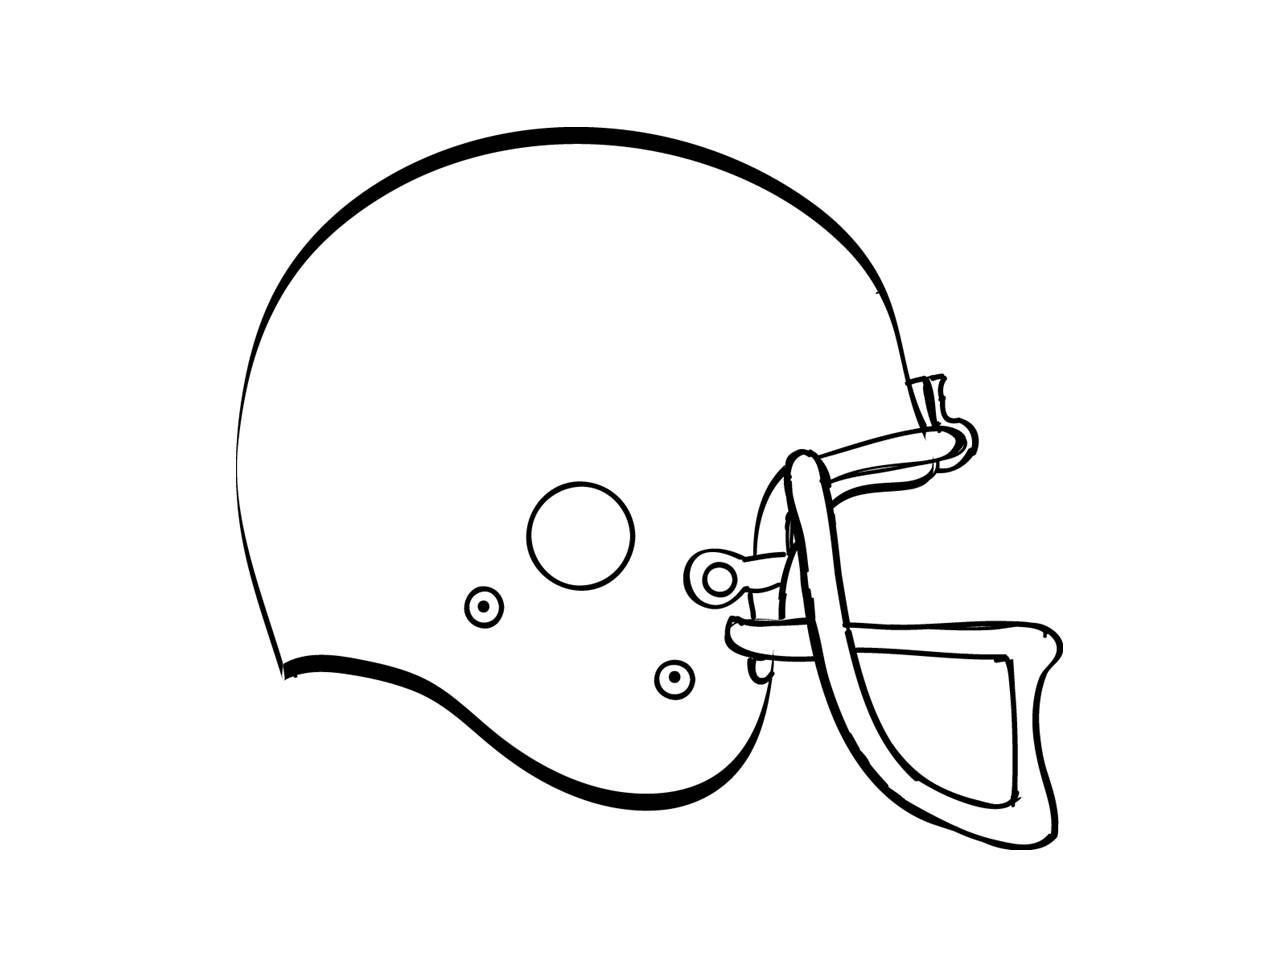 Football Helmet Clip Art Free Clipart Images Image 2 Clipartix Football Helmets Nfl Football Helmets College Football Helmets